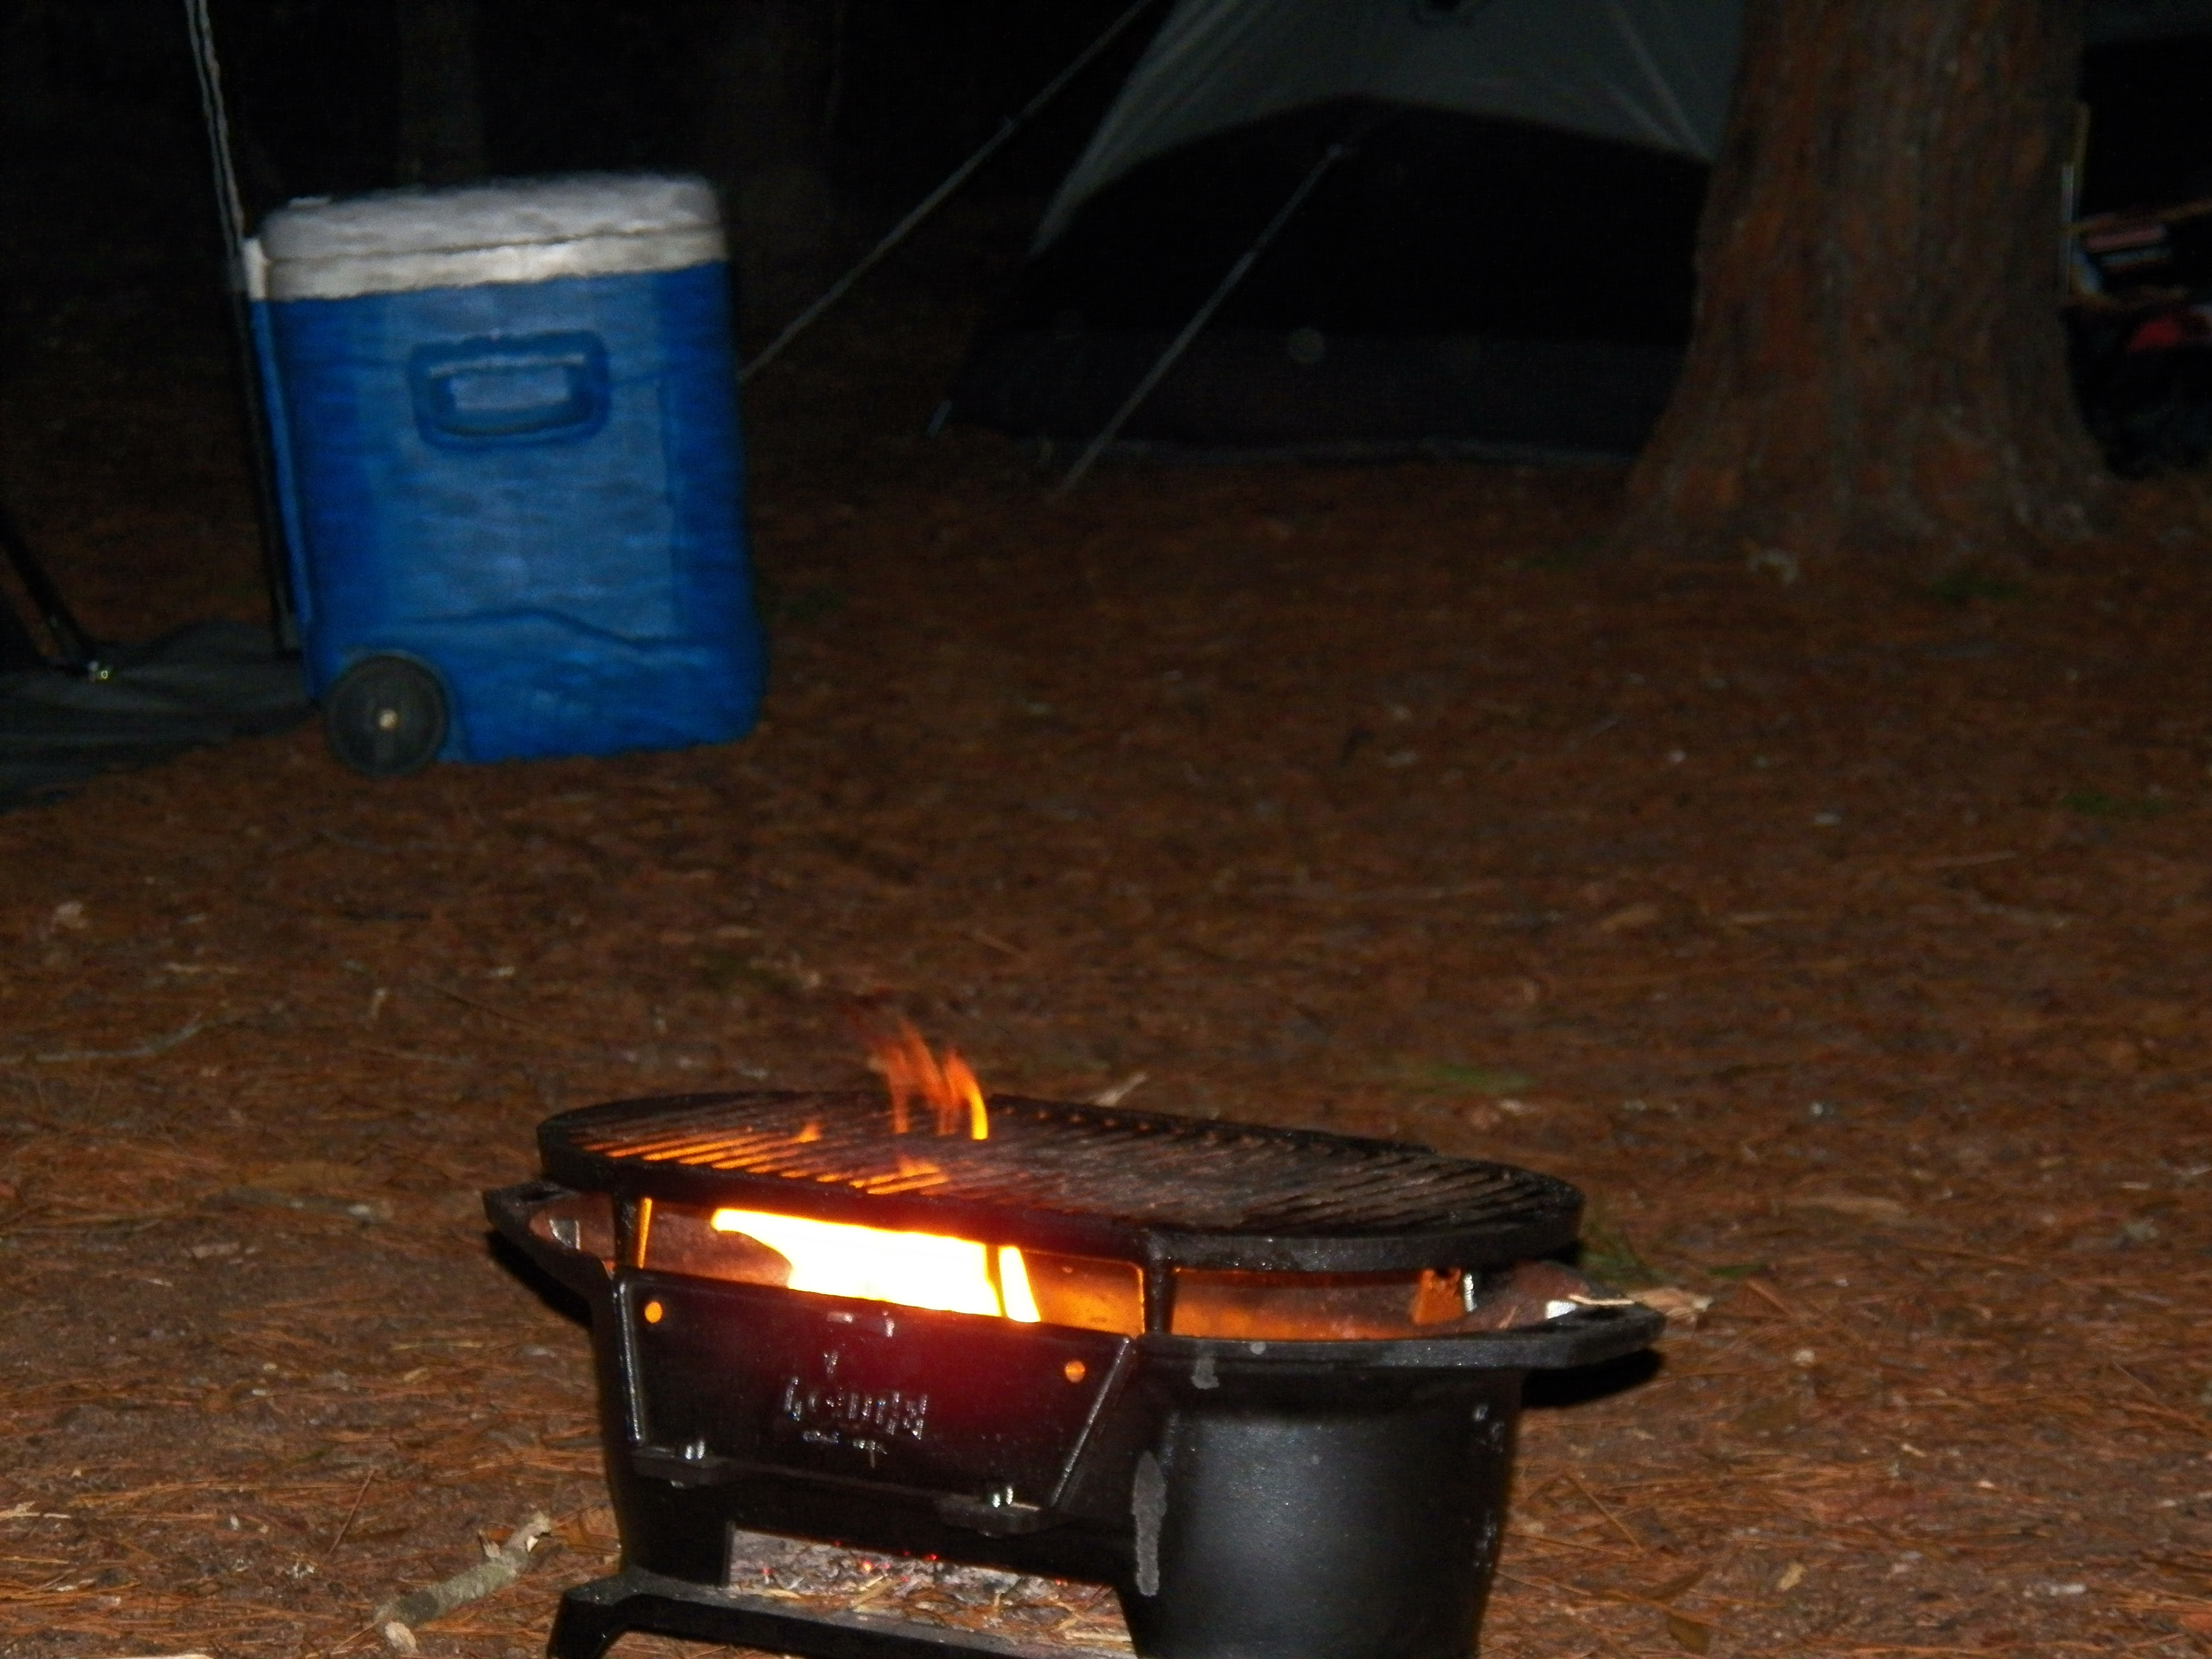 Cub Scout Cub Holiday Camp